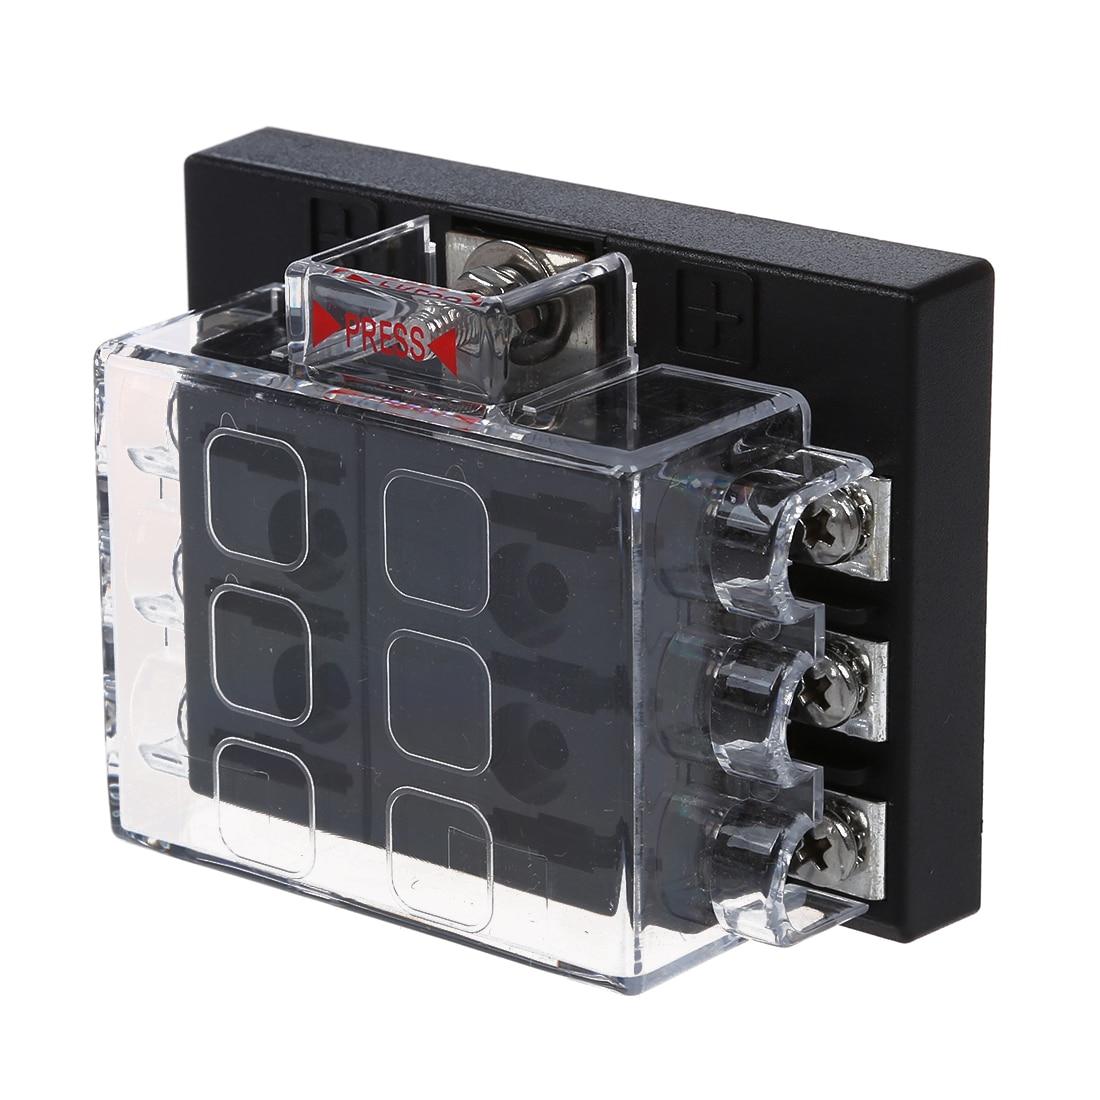 fuse holder box case plug for car autos 6 places in fuses. Black Bedroom Furniture Sets. Home Design Ideas